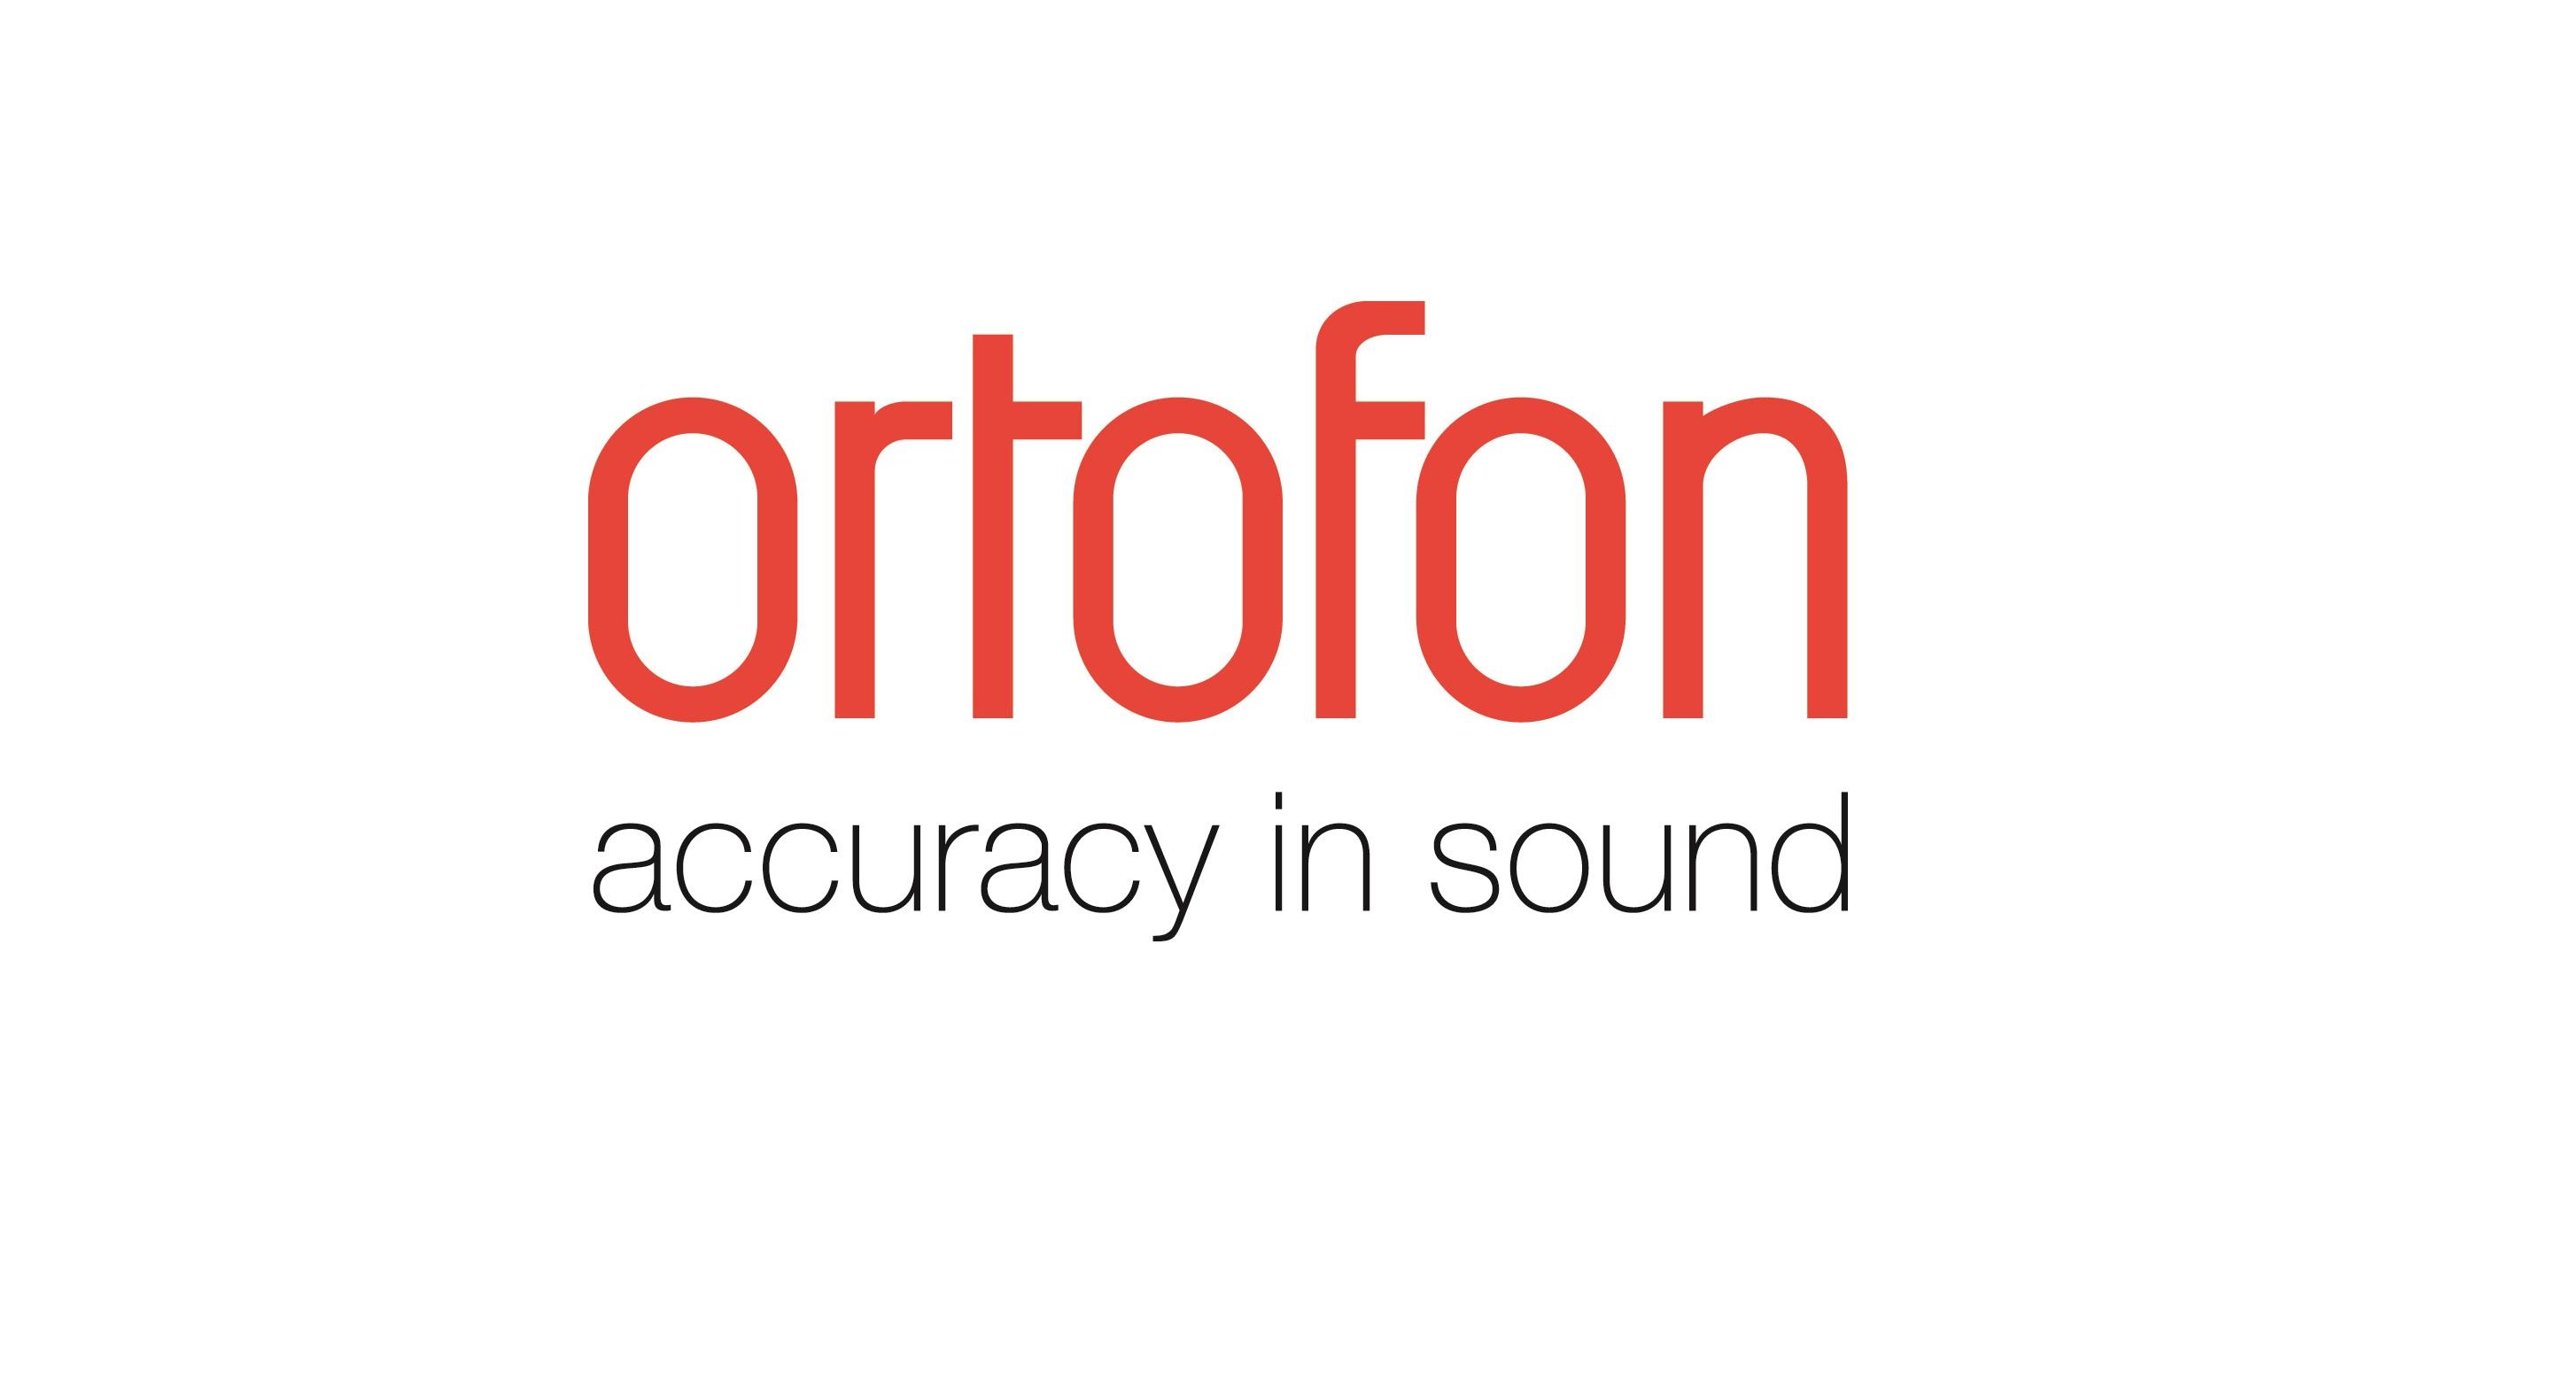 Resultado de imagen de ortofon logo